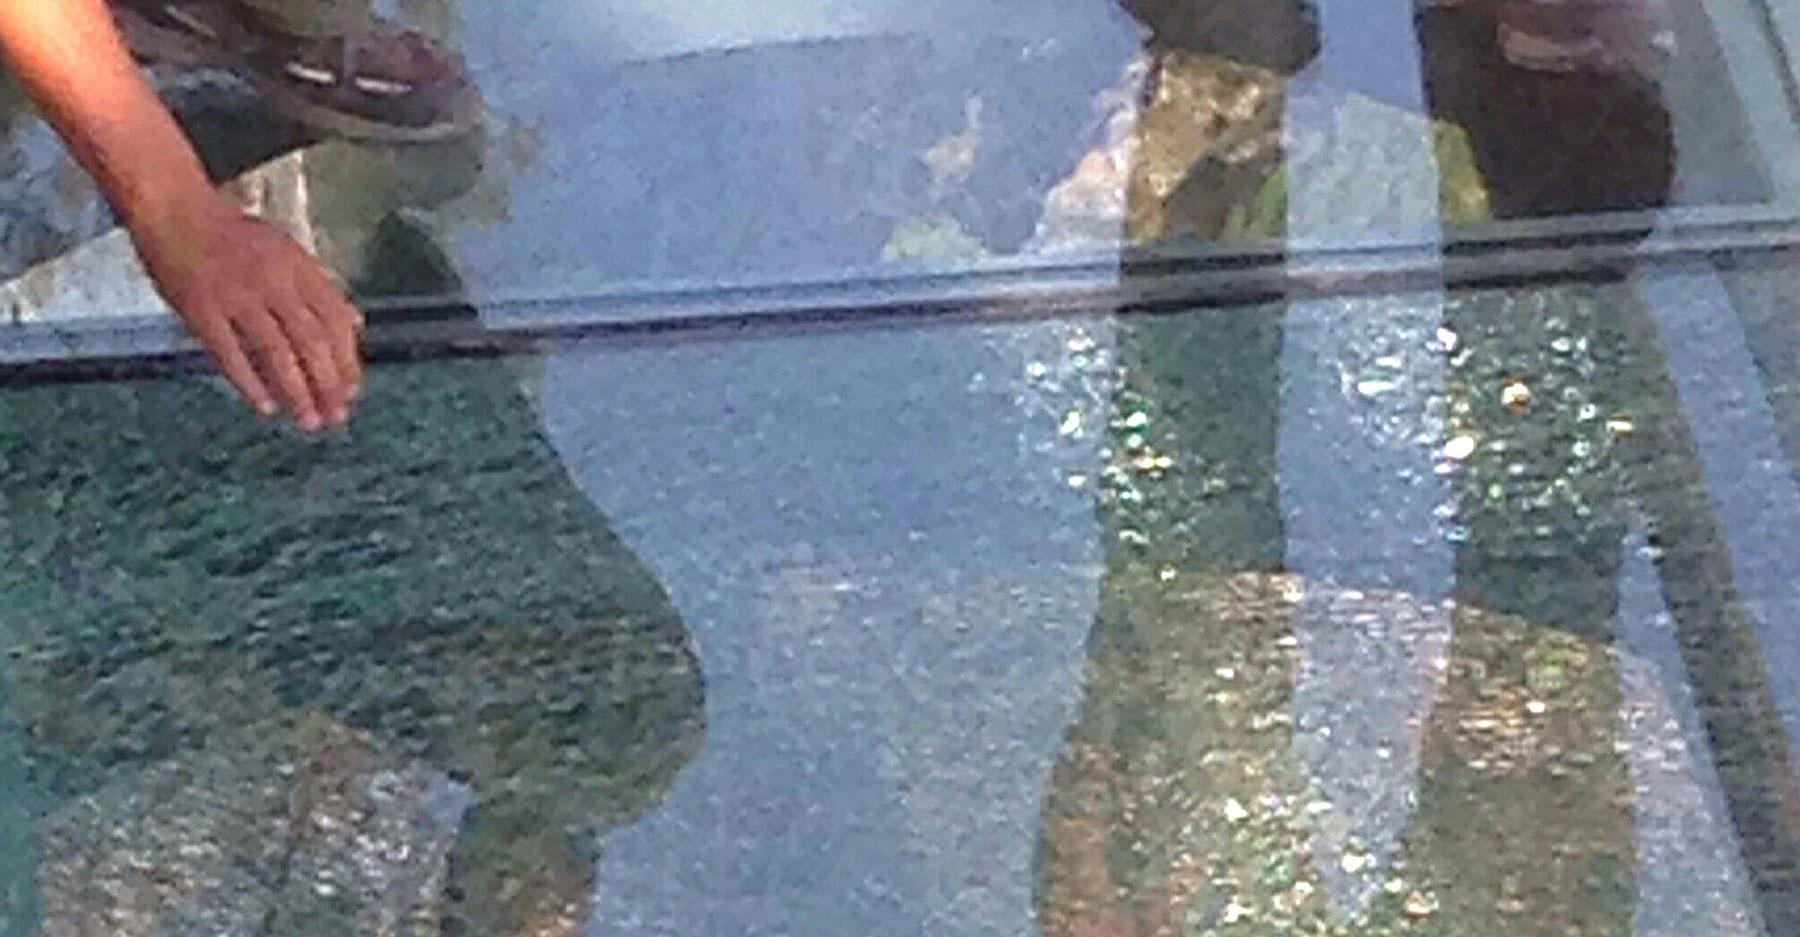 Shattered glass bridge in China